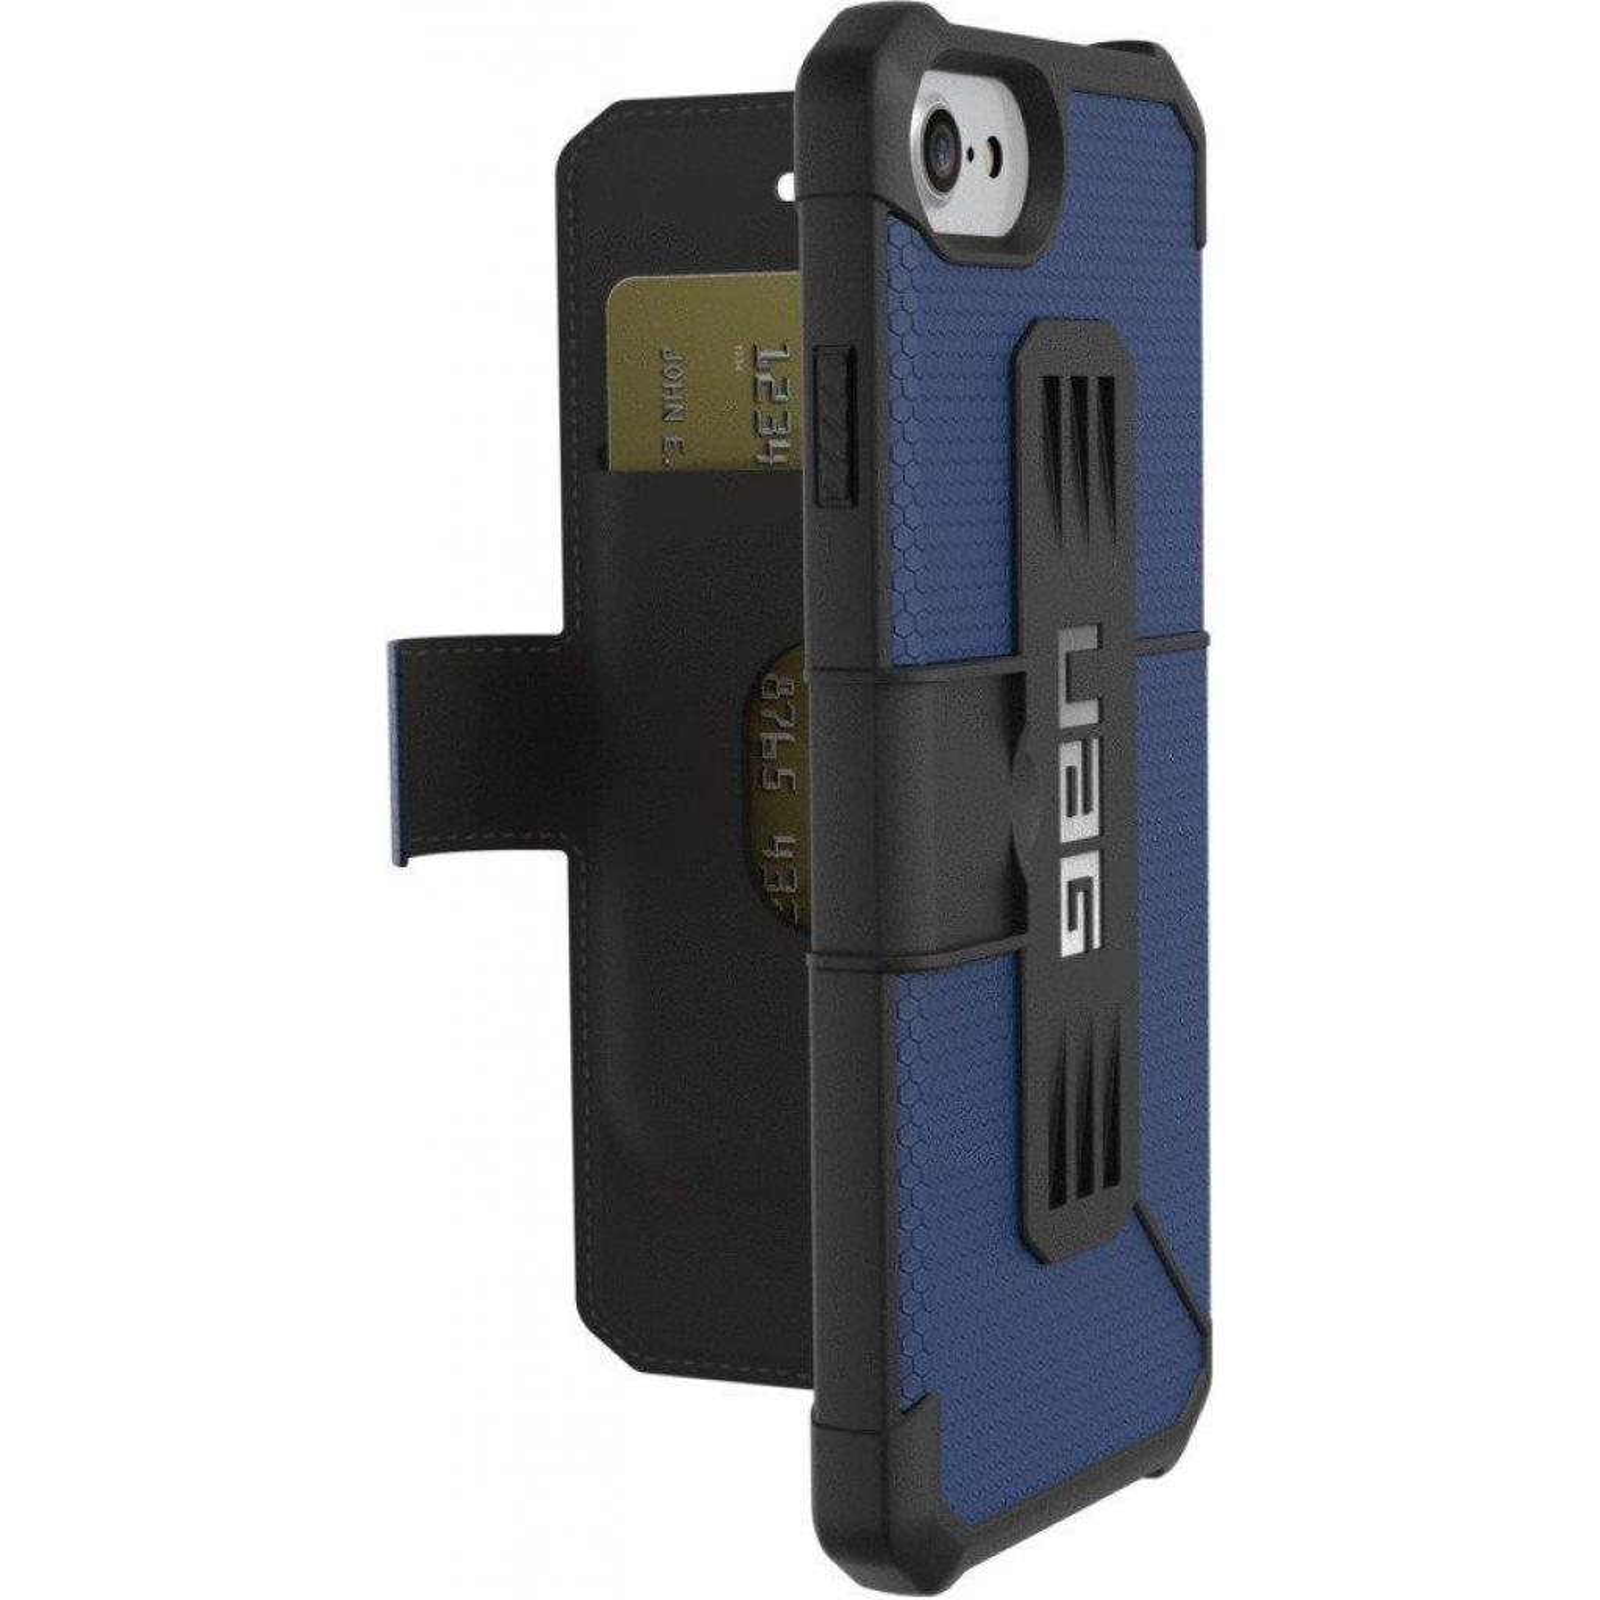 Чехол для моб. телефона UAG iPhone 8/7/6S/6 Metropolis Blue (IPH8/7-E-CB) изображение 5